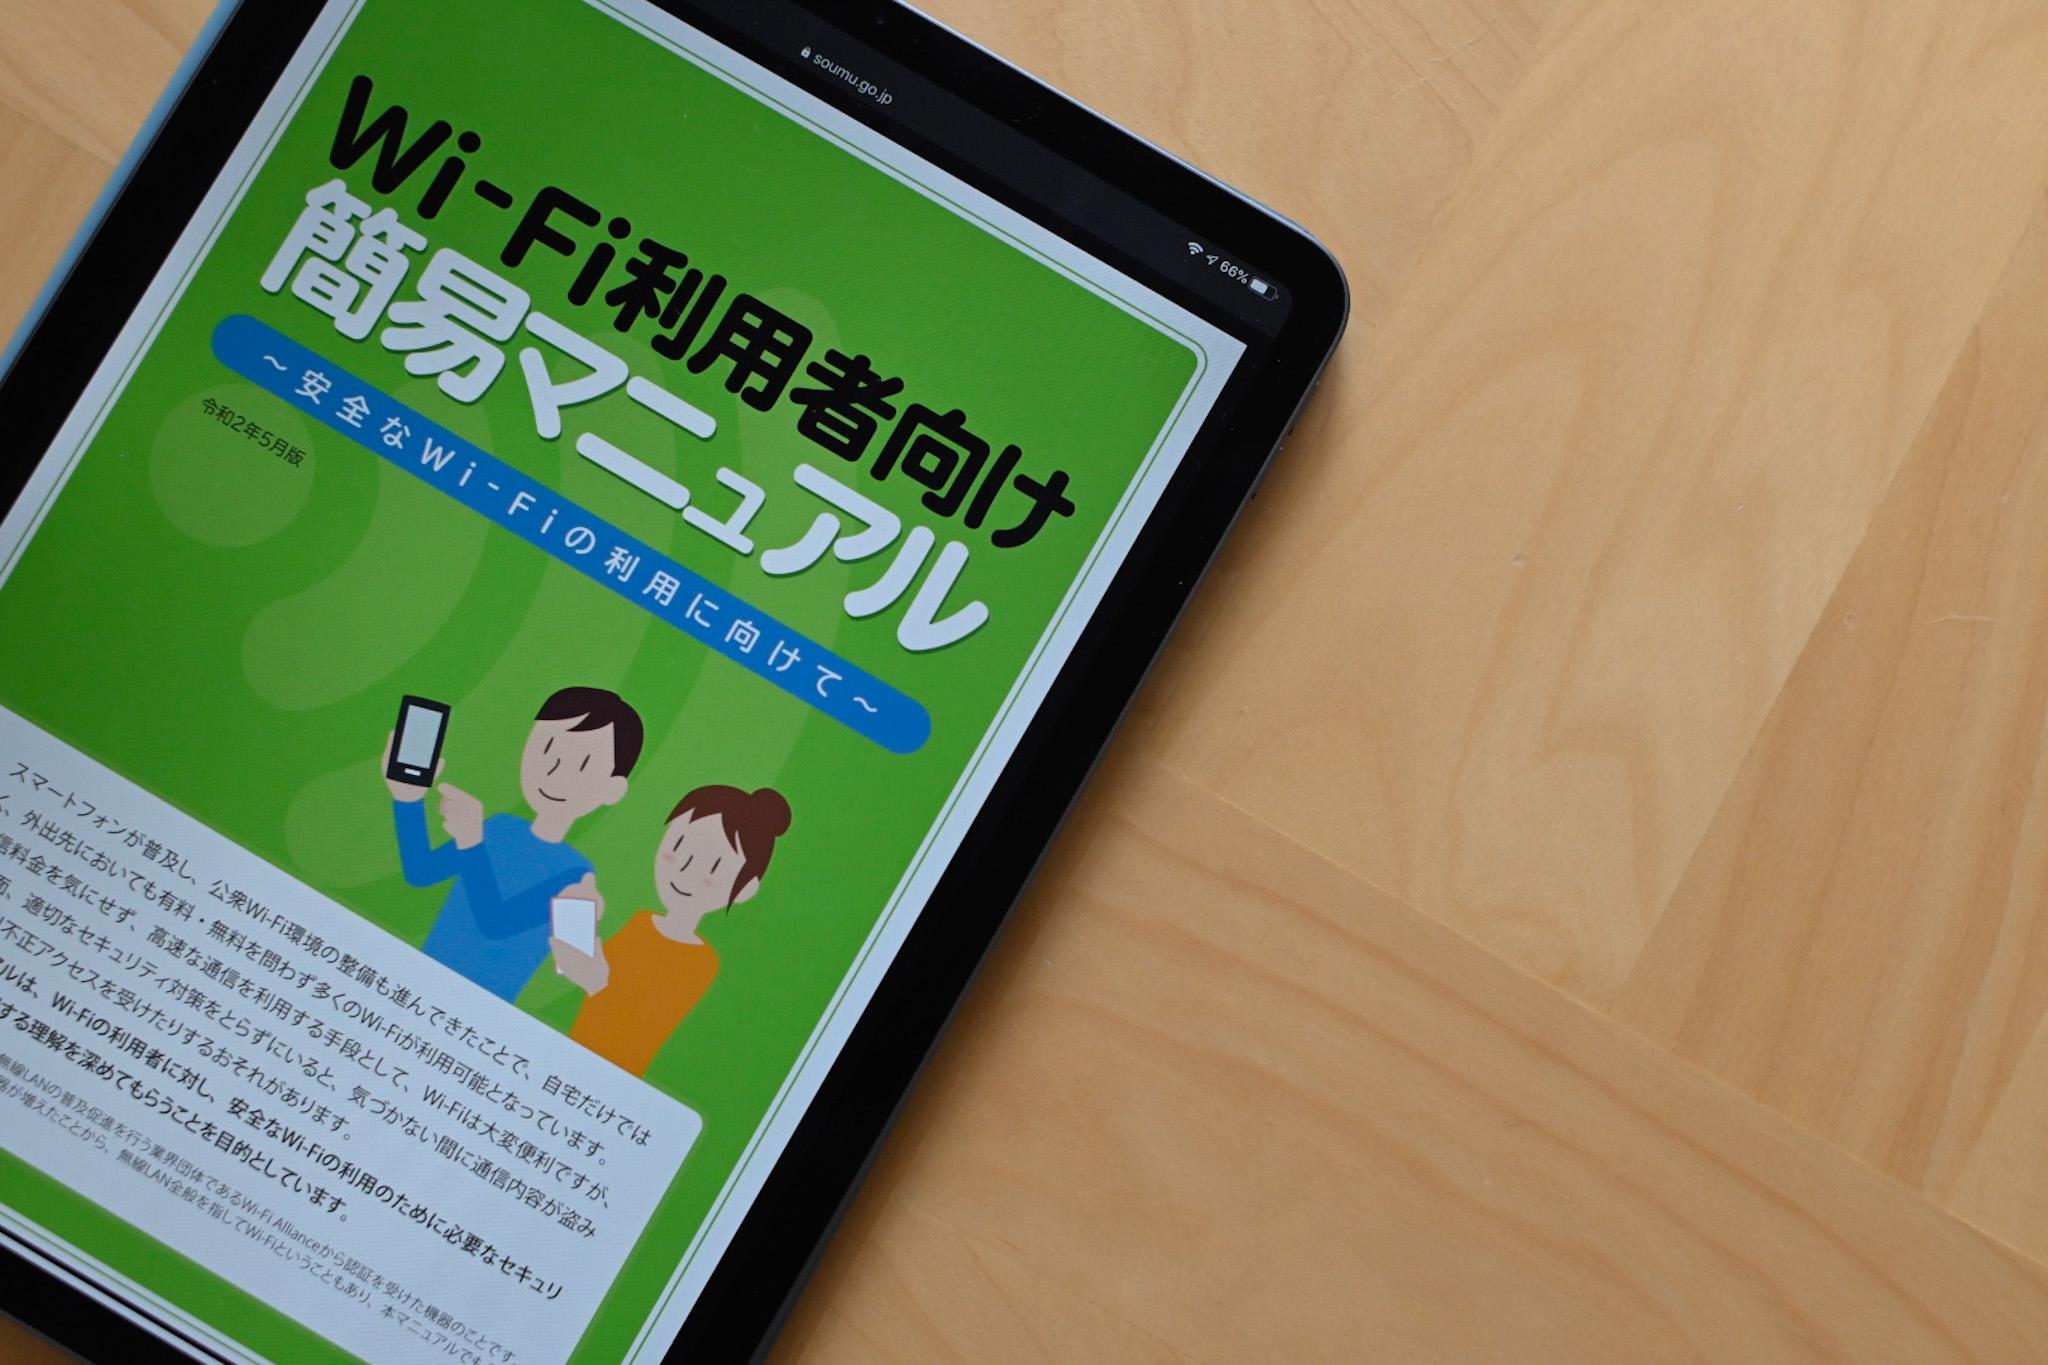 Wifi-users-manual-somusho-edition-1